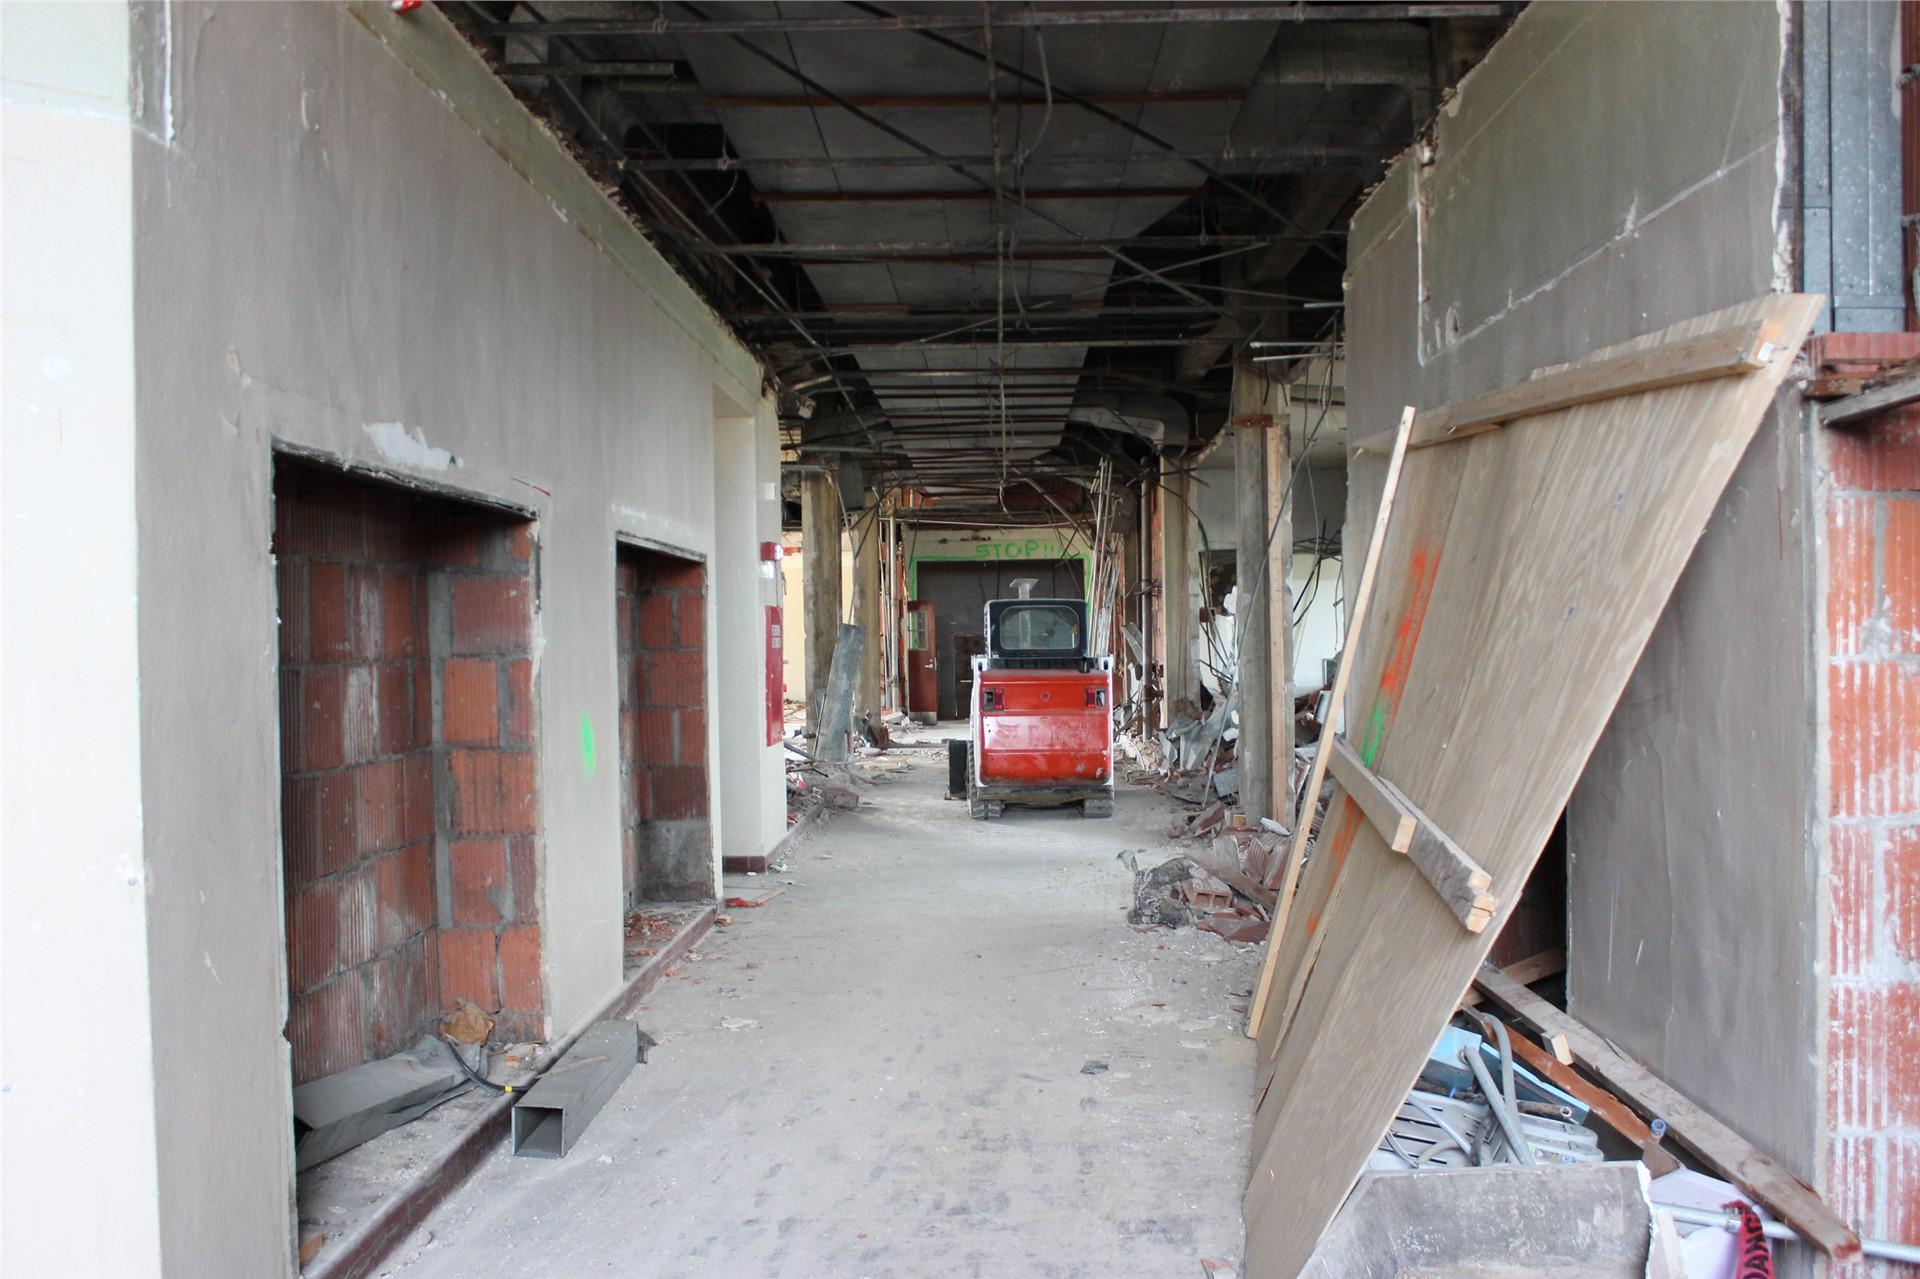 Third floor, former Renaissance area